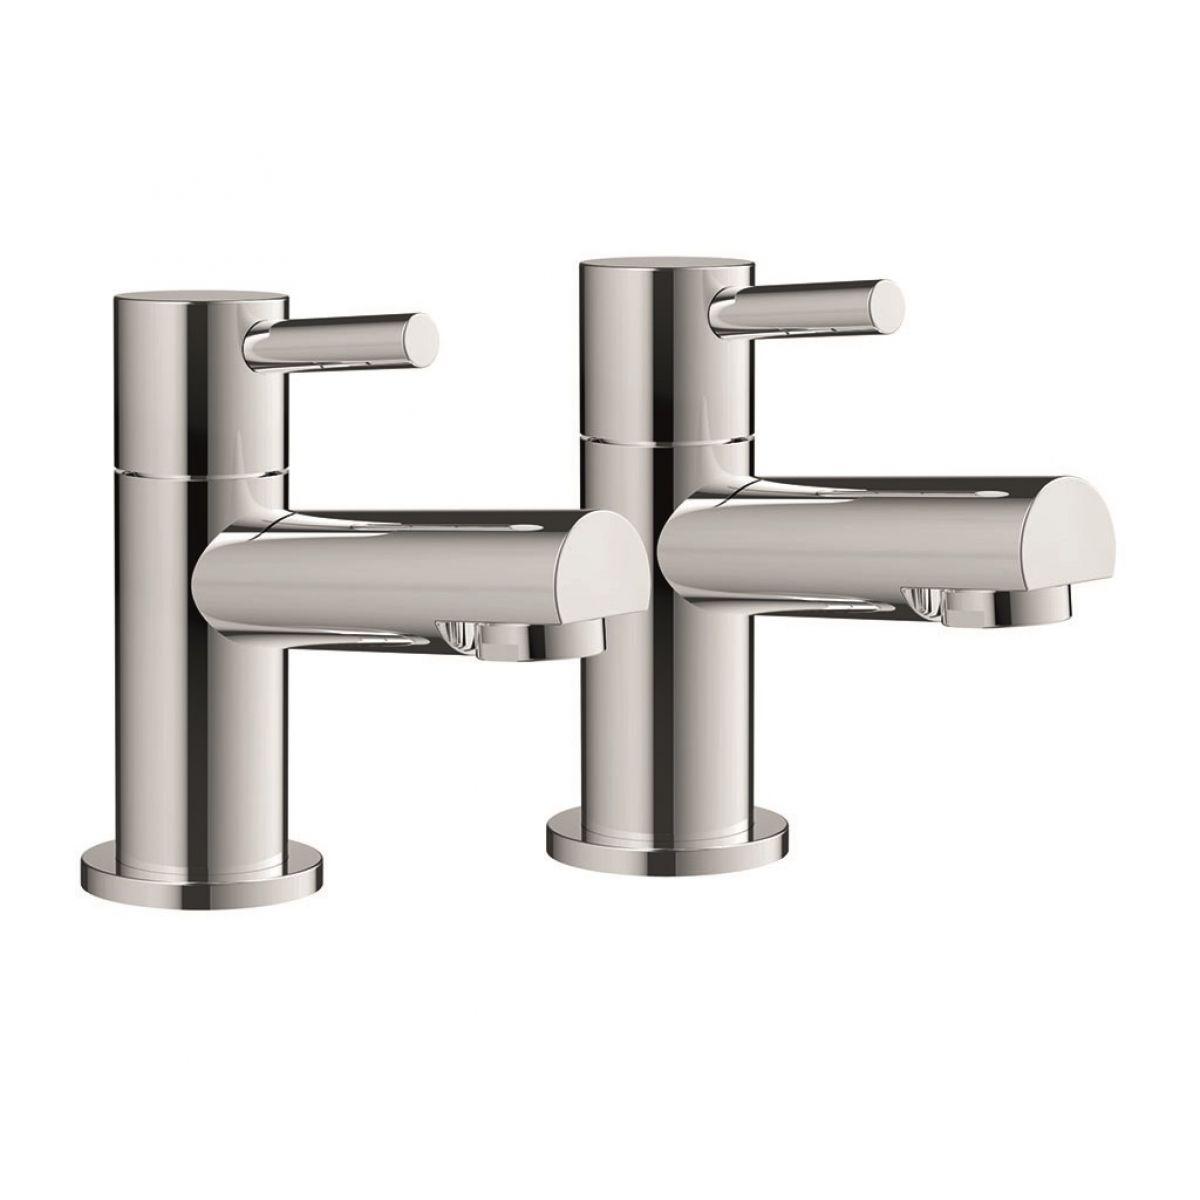 UK Bathrooms Essentials Holden Bath Taps